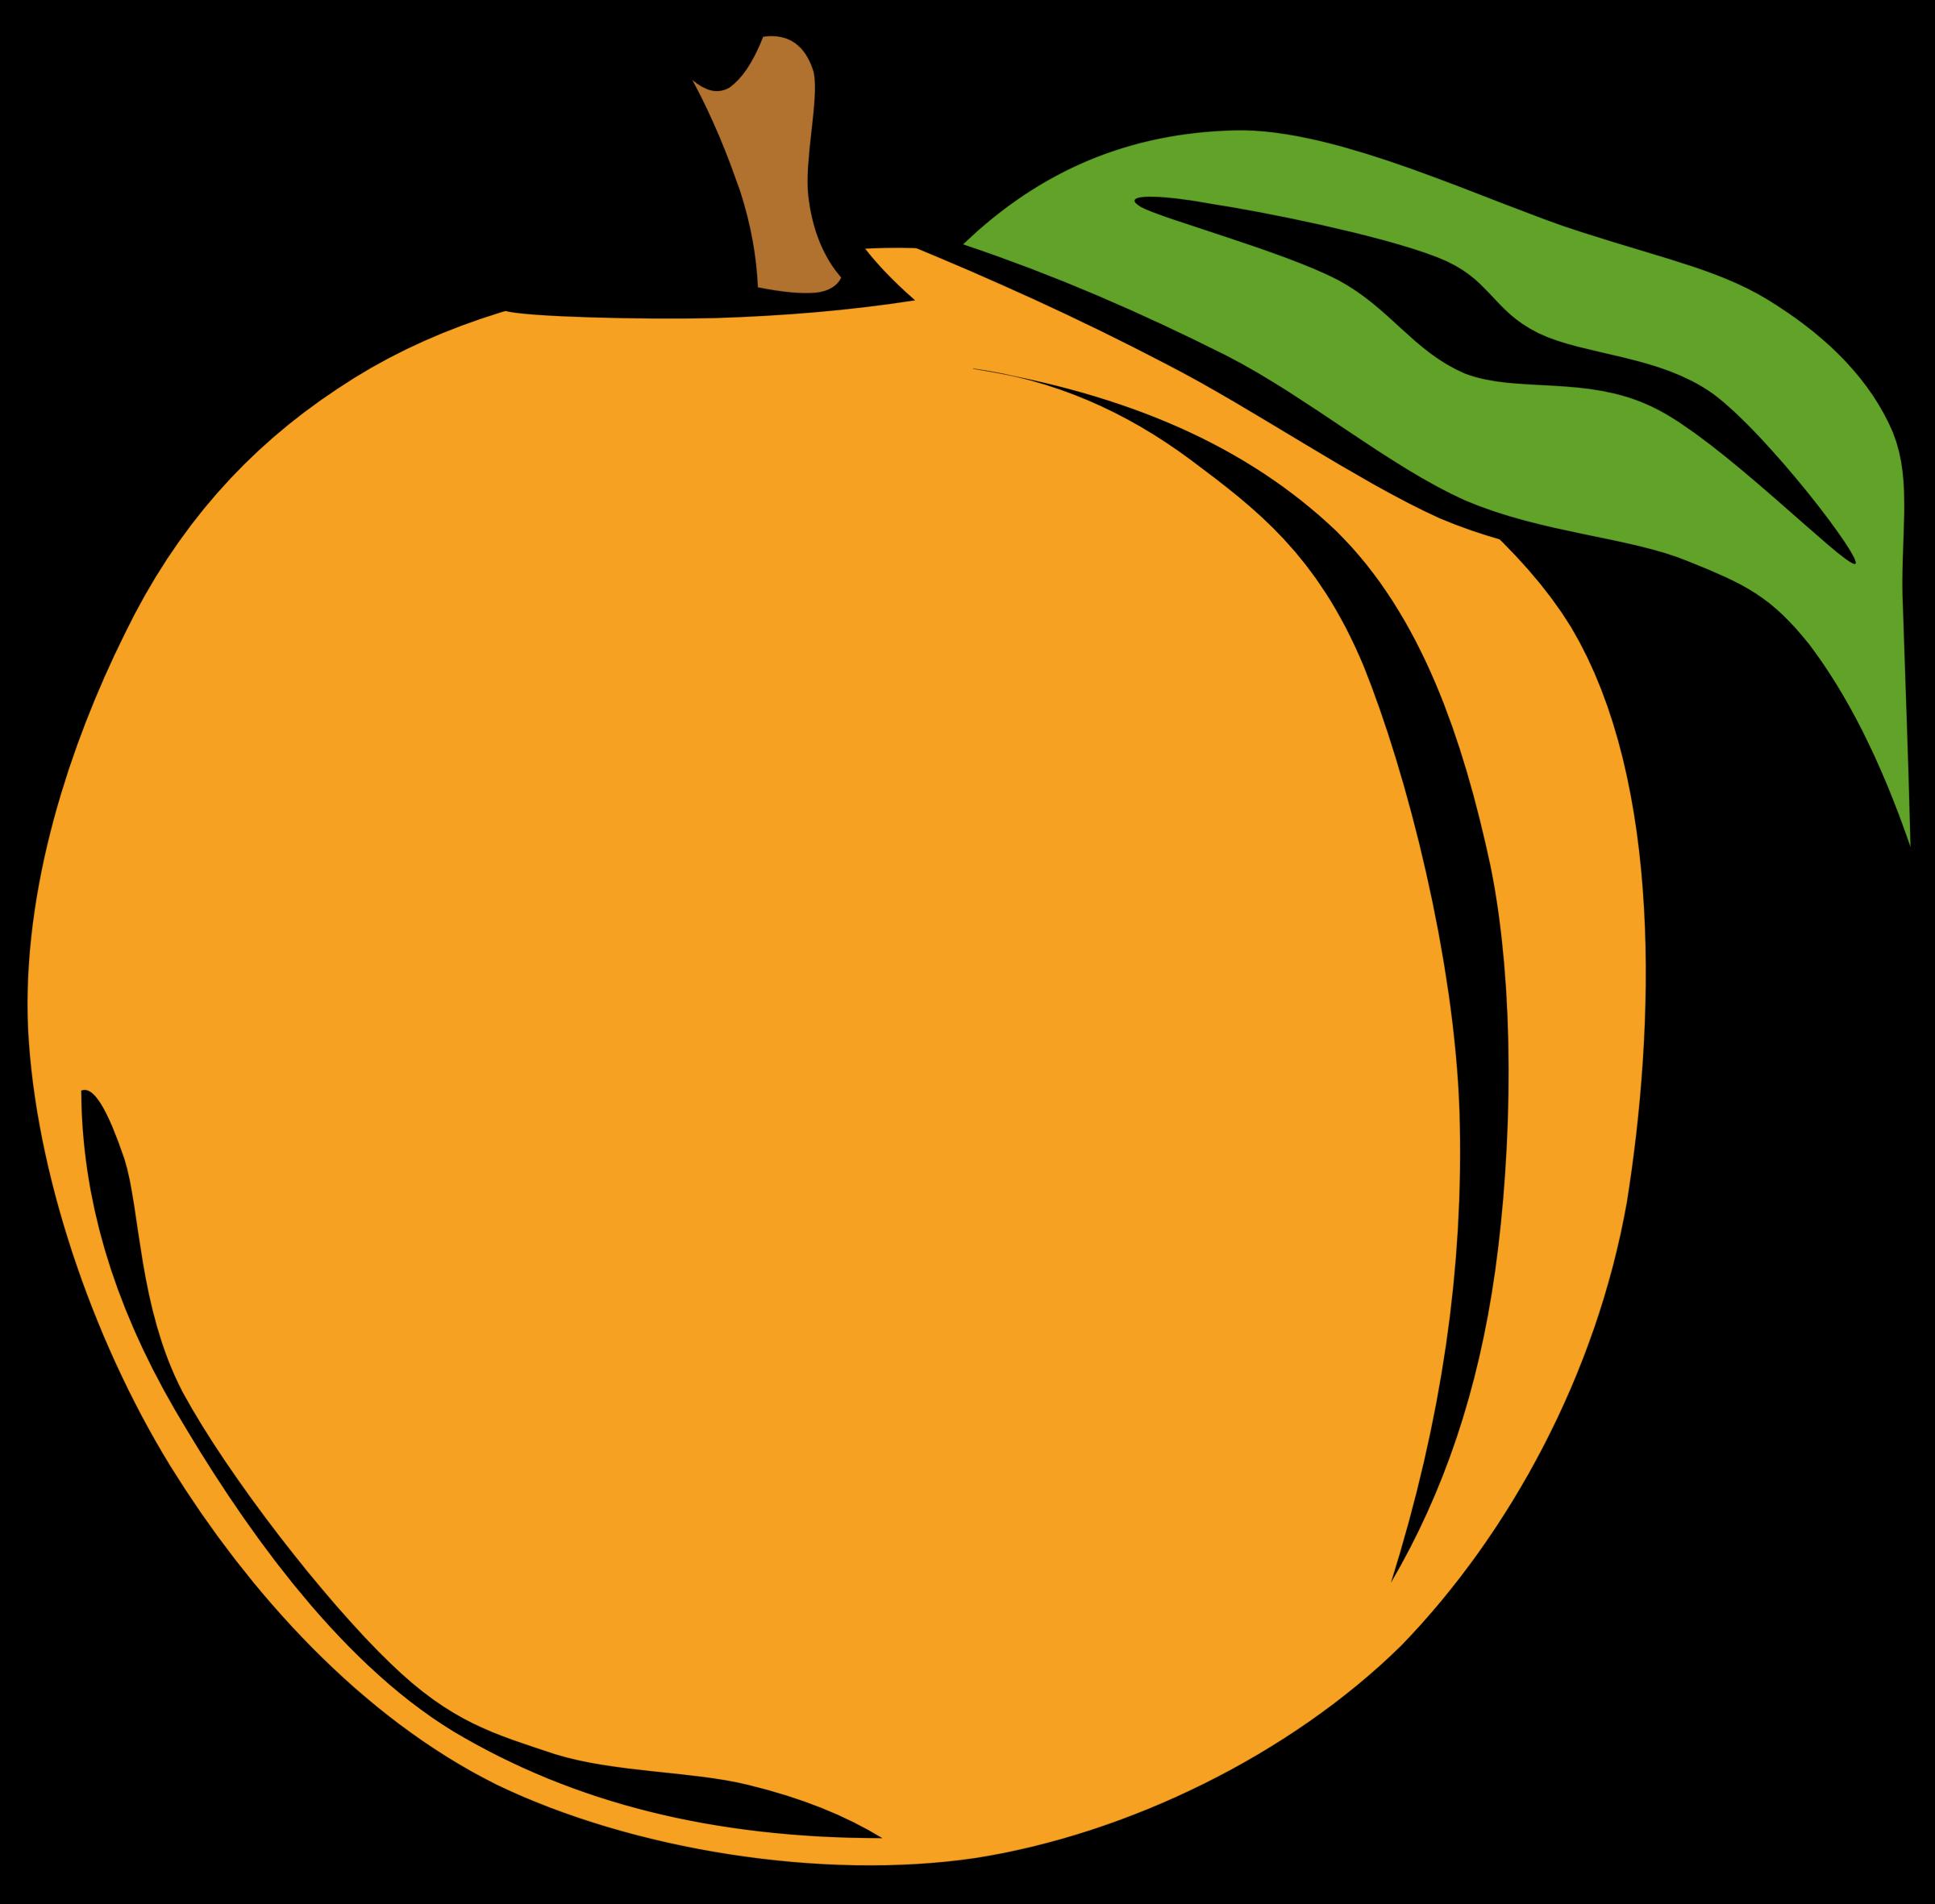 Clipart fruit yellow fruit. Simple peach big image